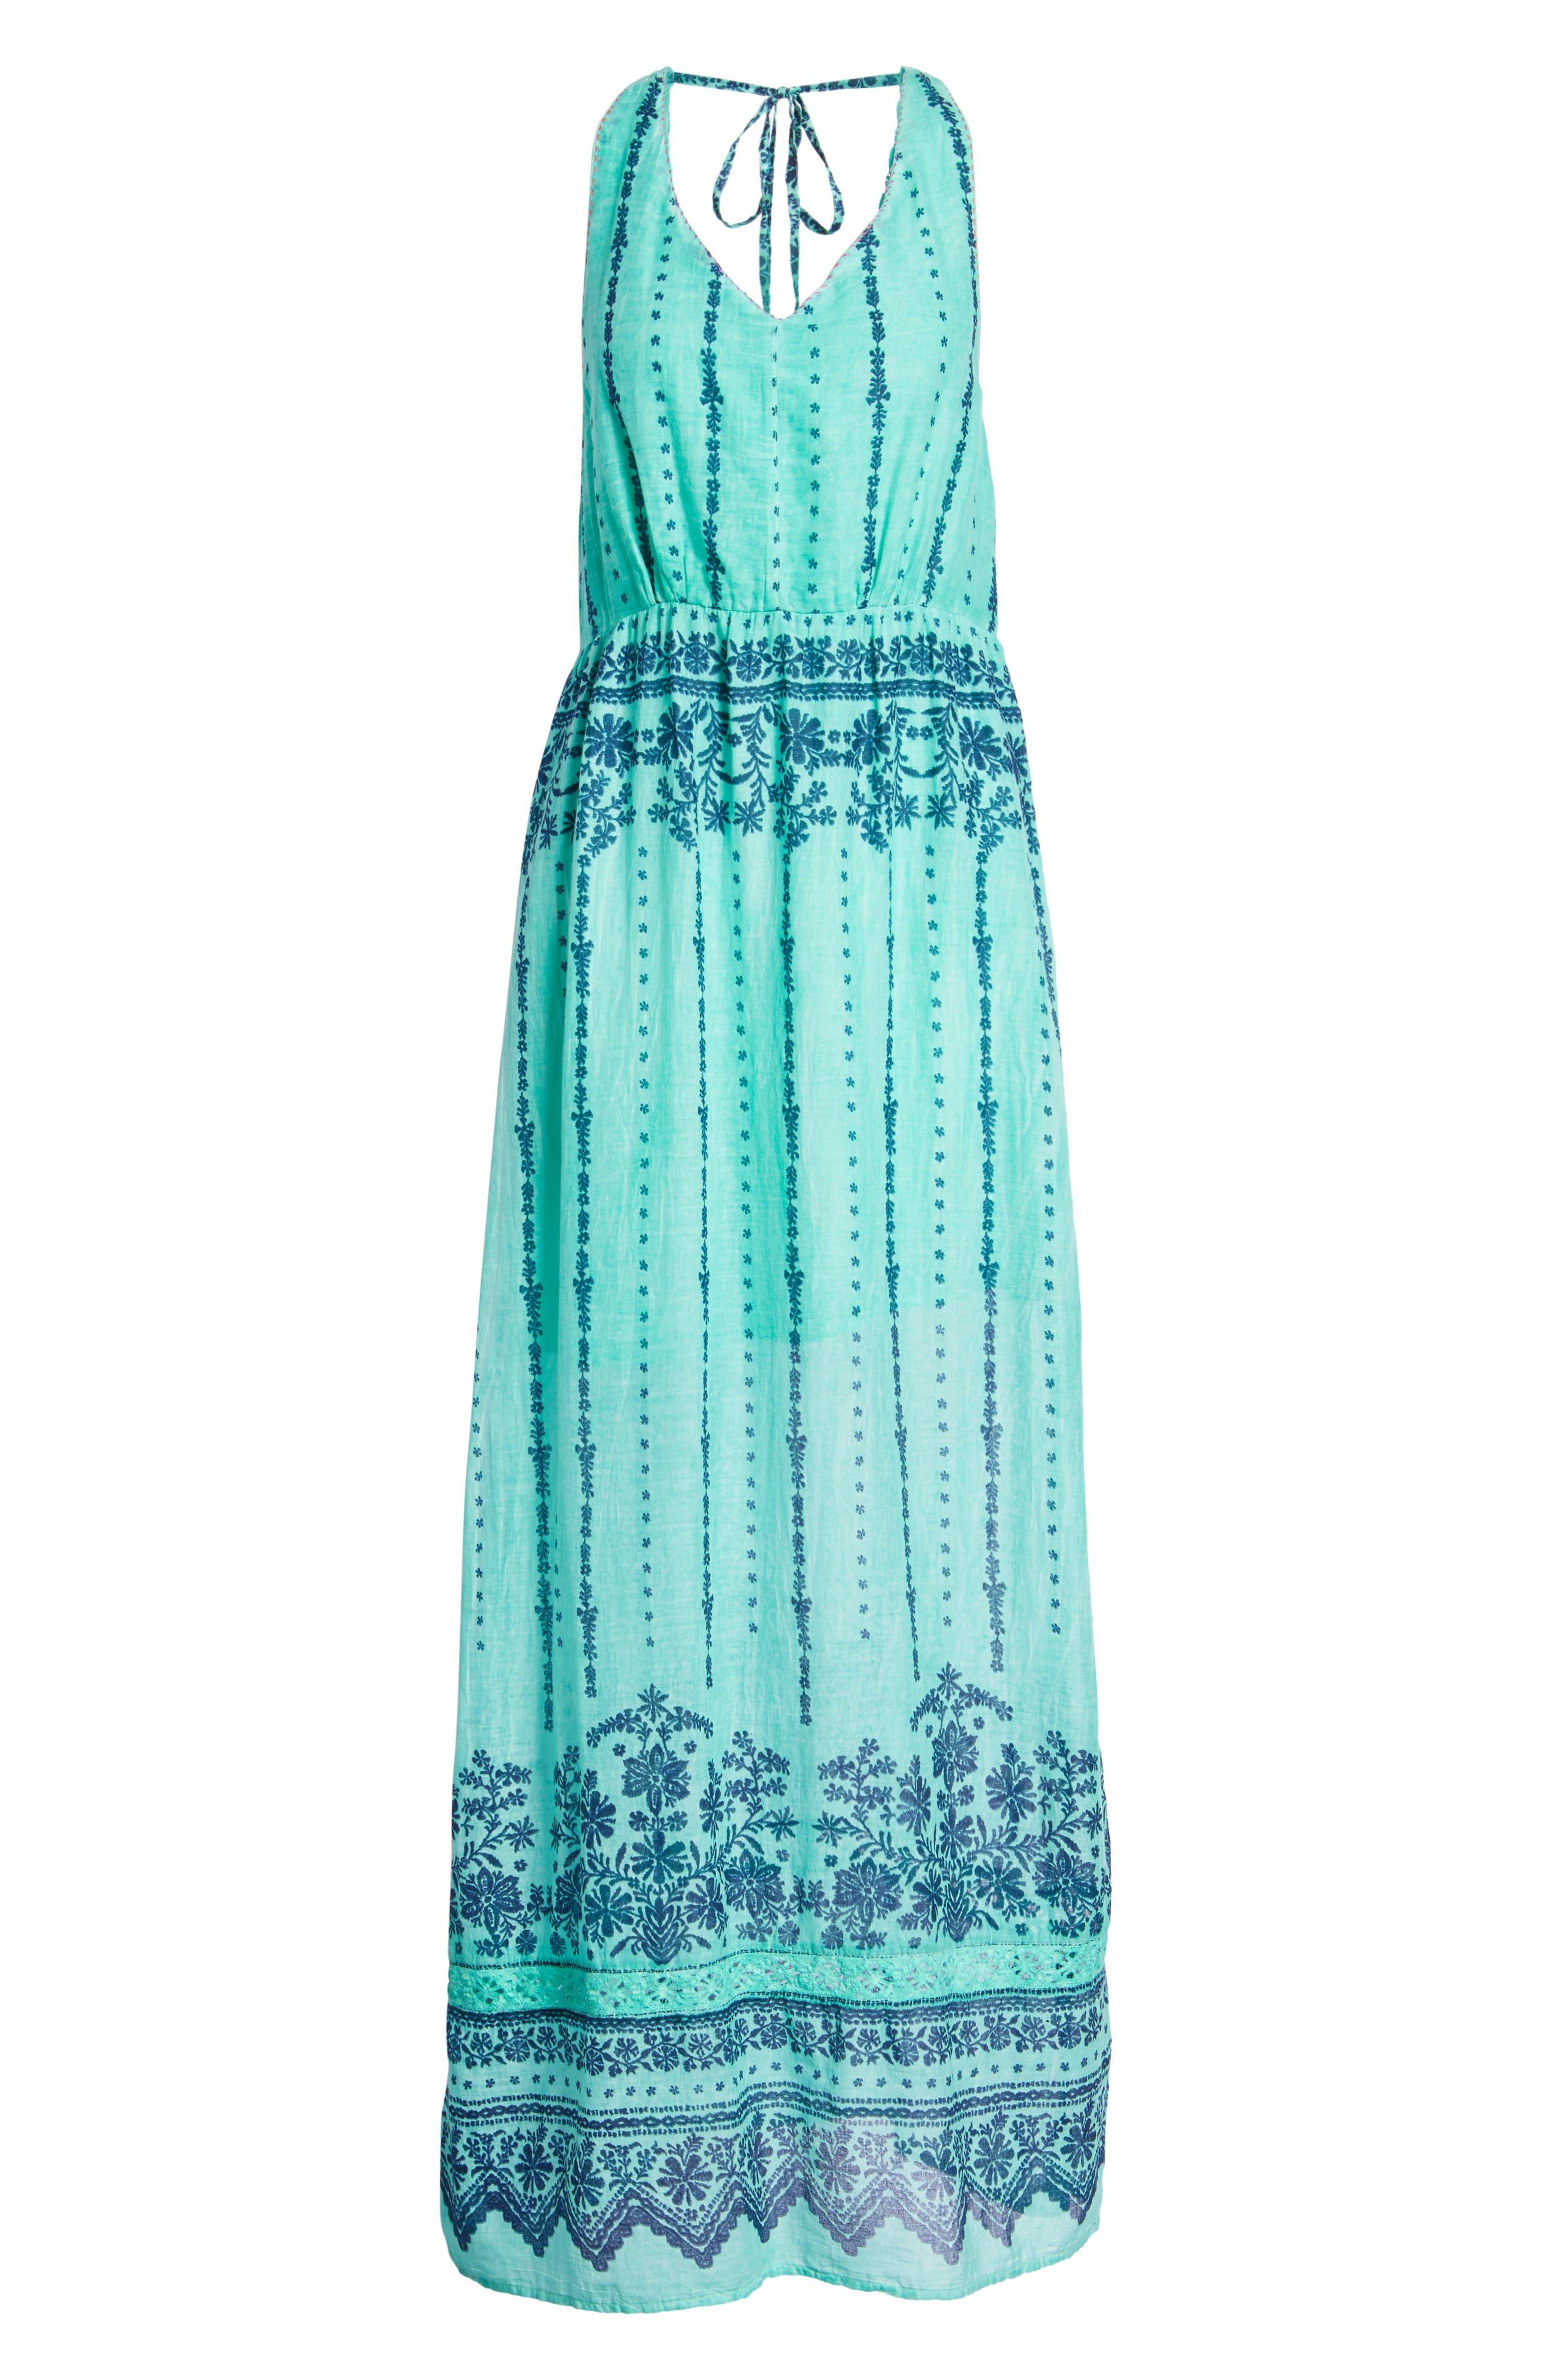 La Playita Maxi Dress,                             Alternate thumbnail 7, color,                             300